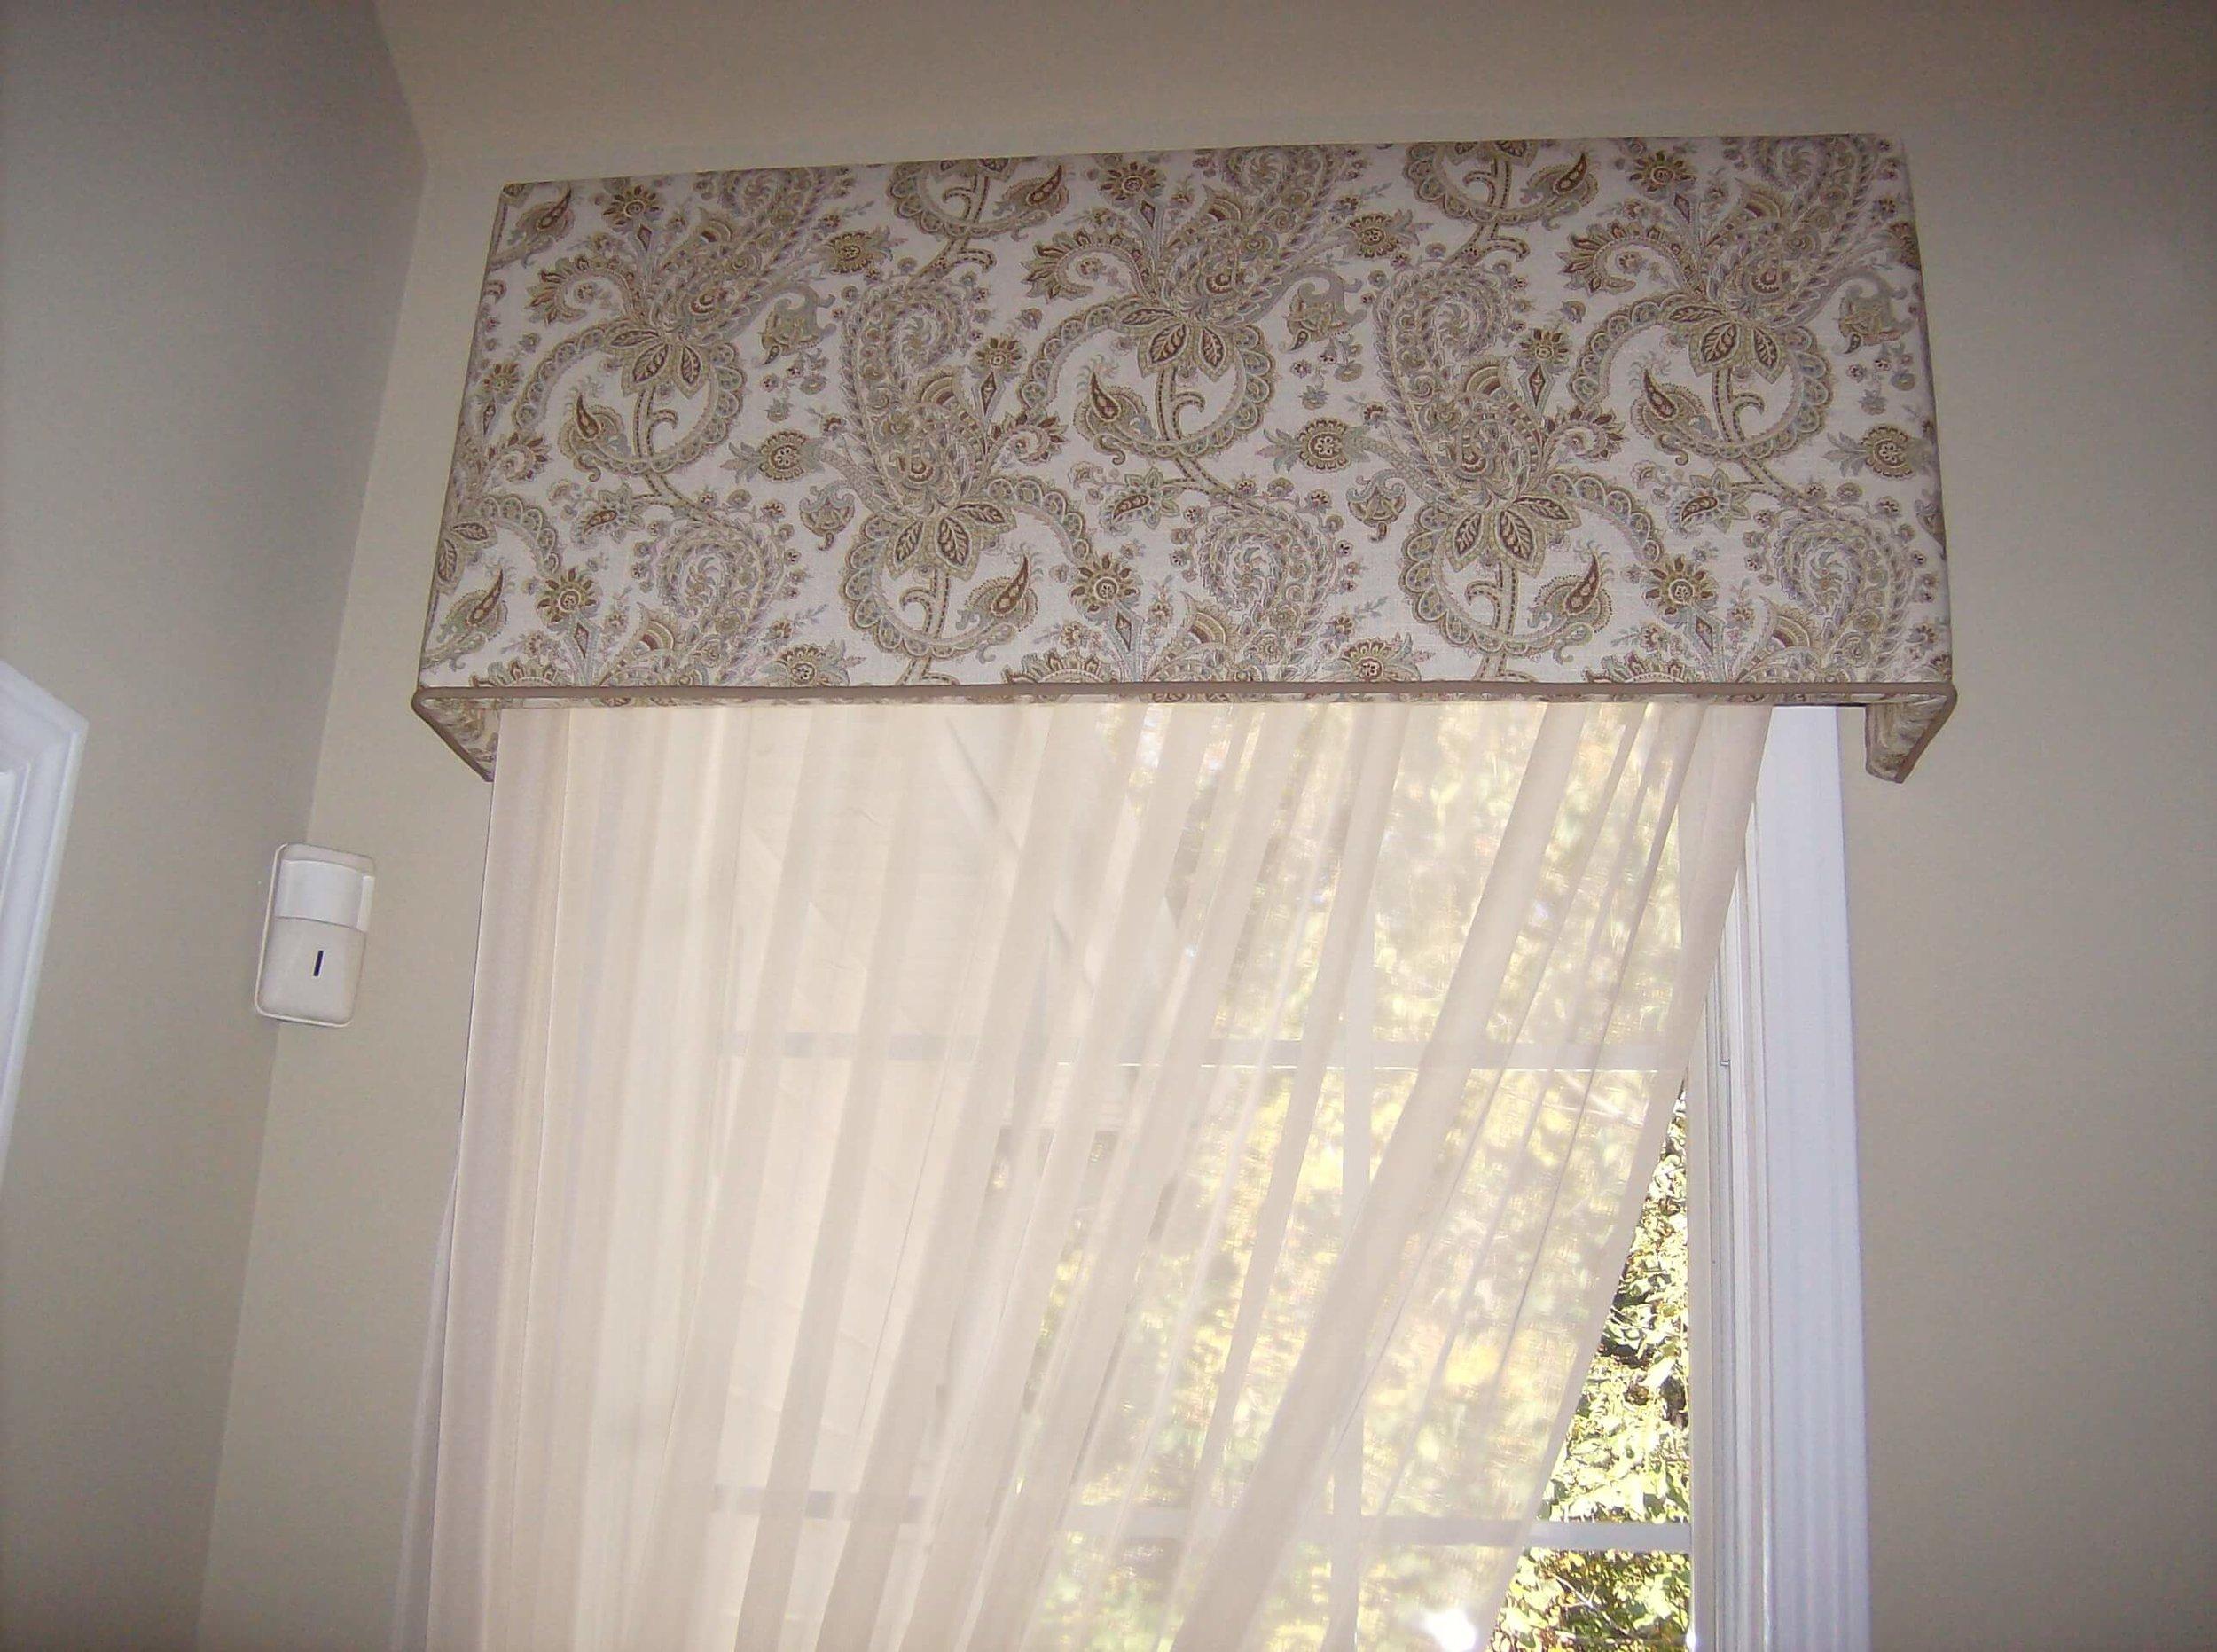 custom-blinds-drapery-shades-interior-design-atlanta-georgia-39.JPG